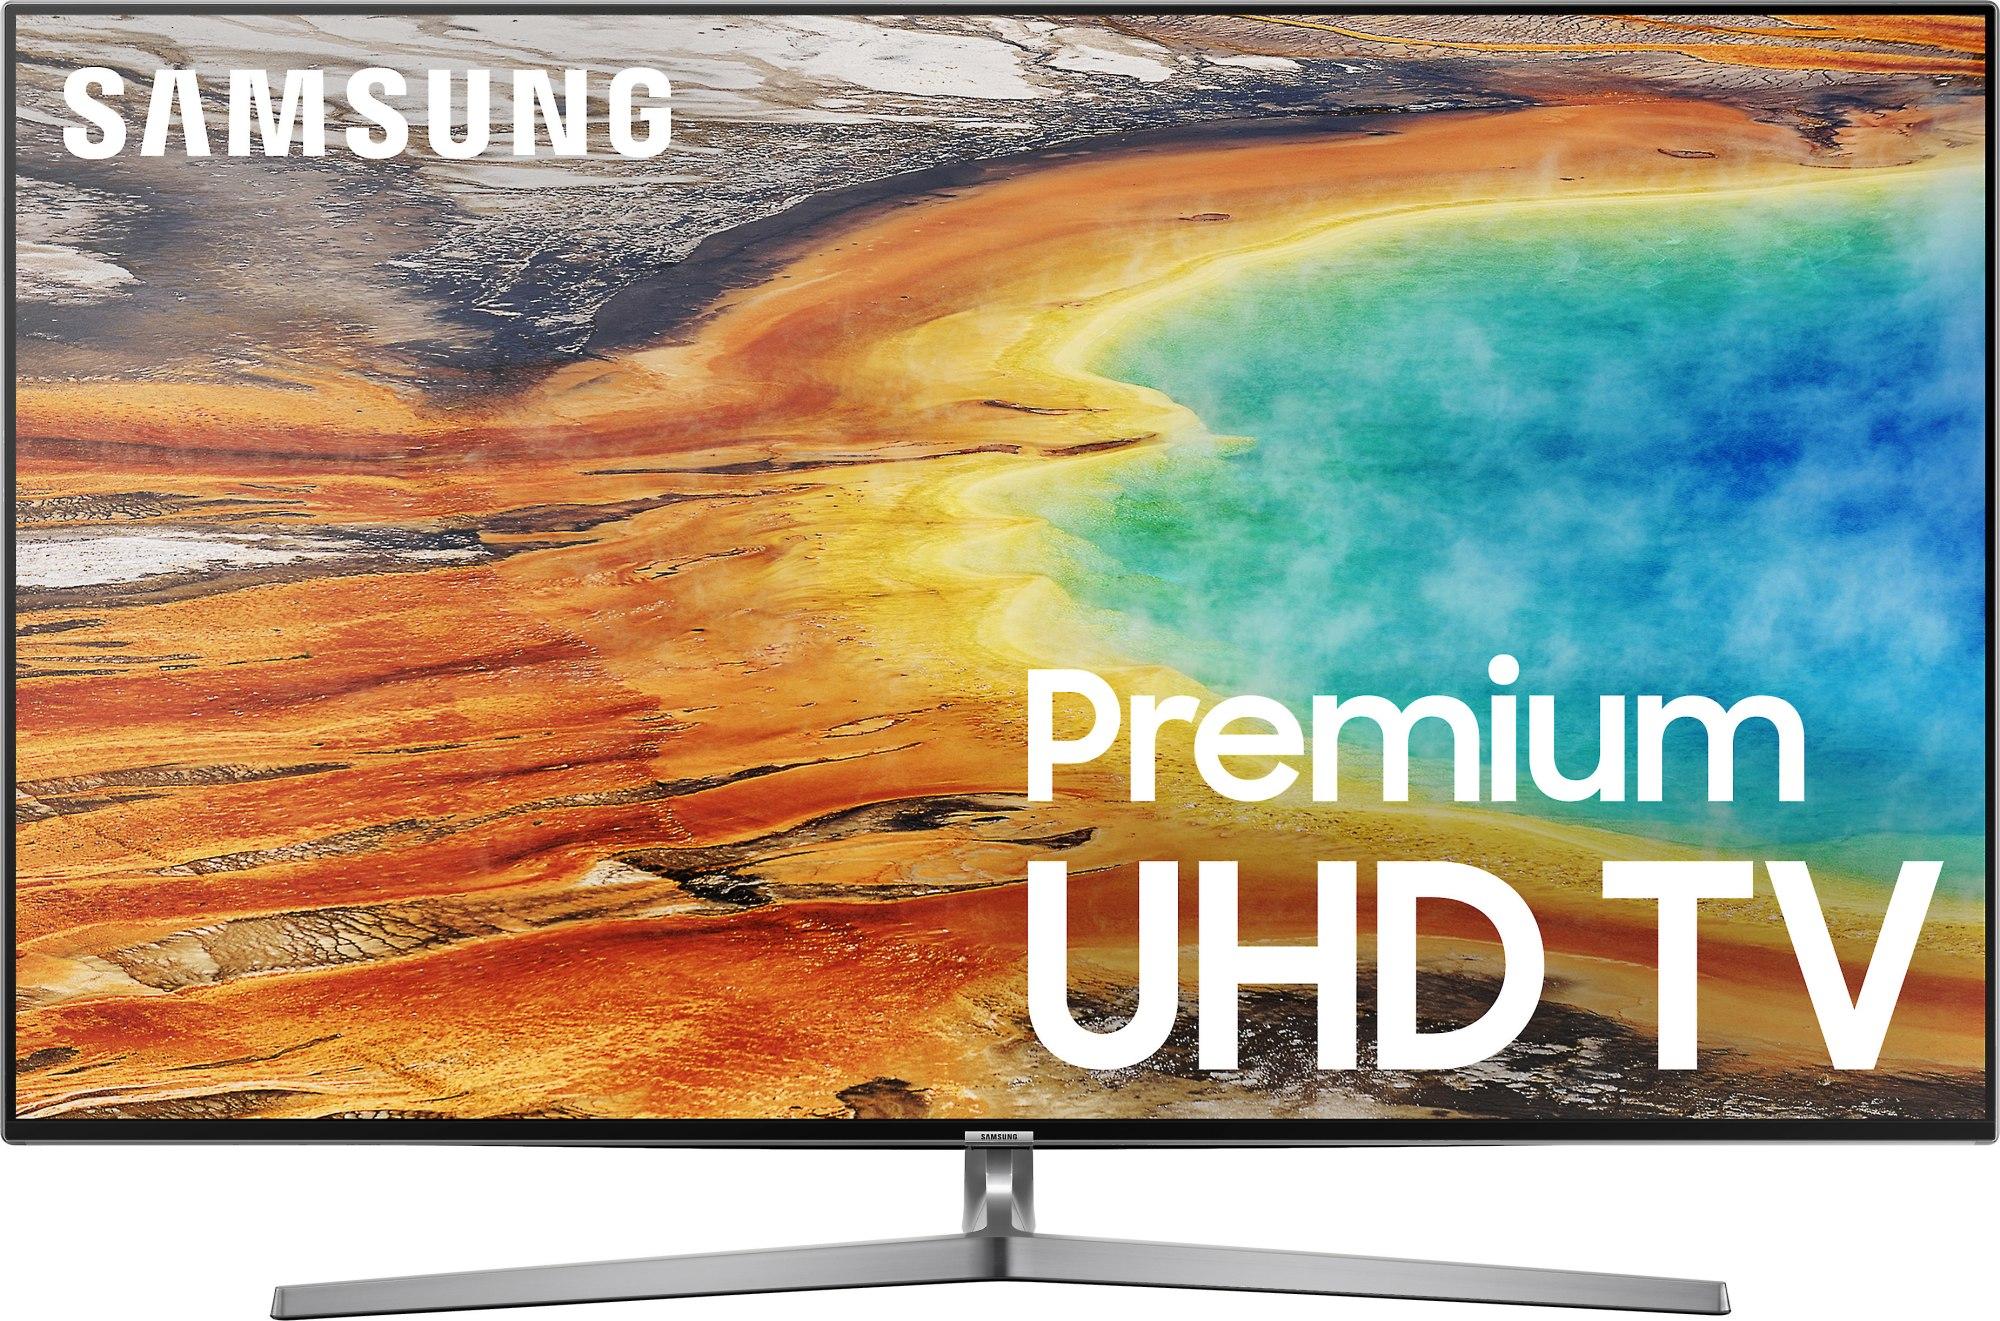 hight resolution of samsung un65mu9000 65 smart led 4k ultra hd tv with hdr 2017 model at crutchfield com